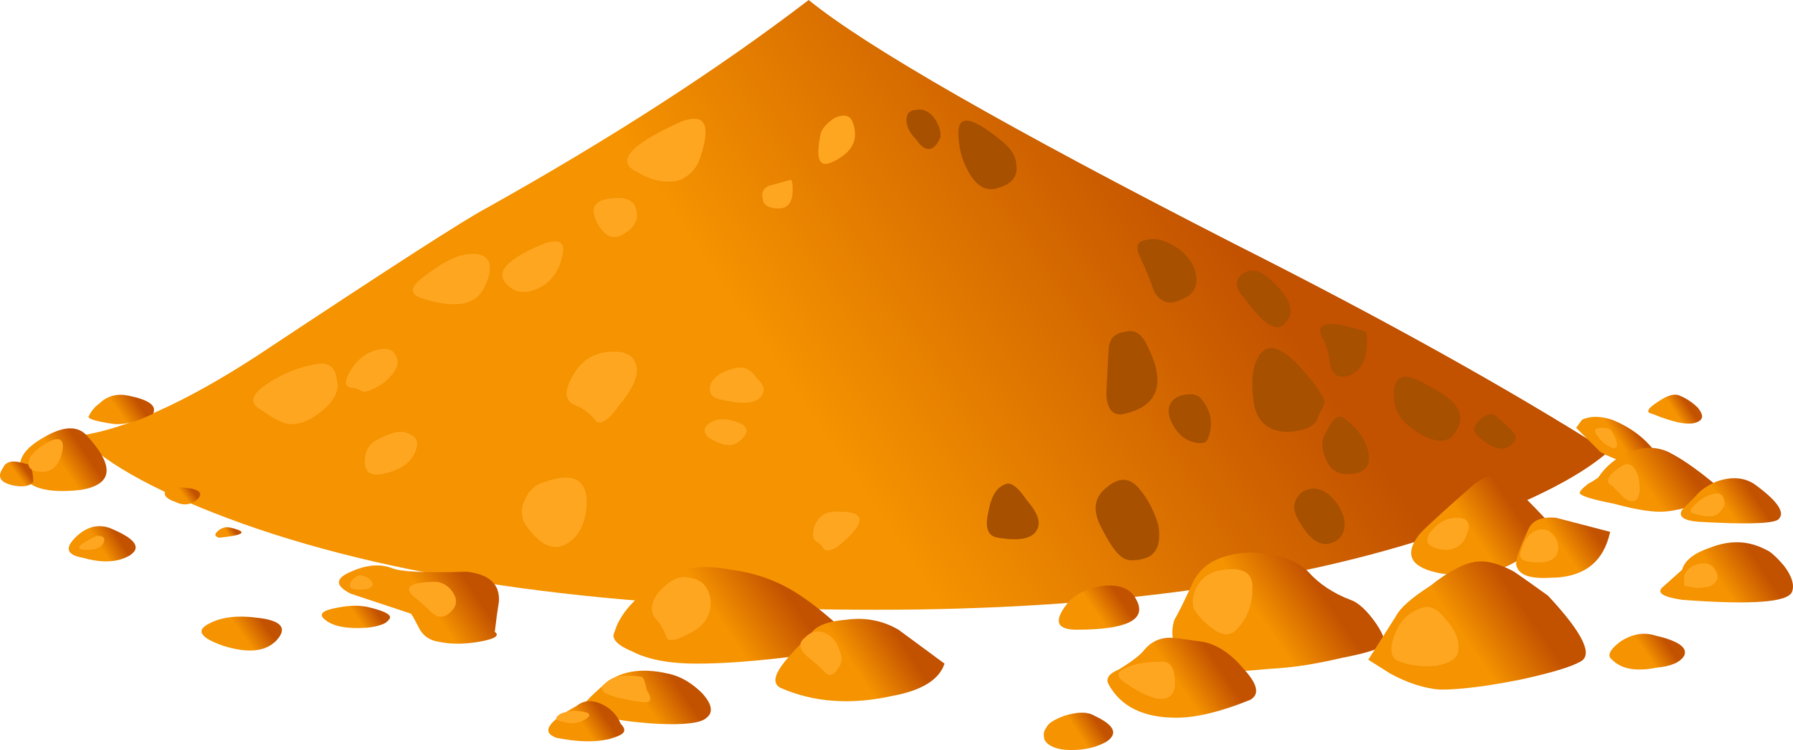 Triangle,Food,Orange